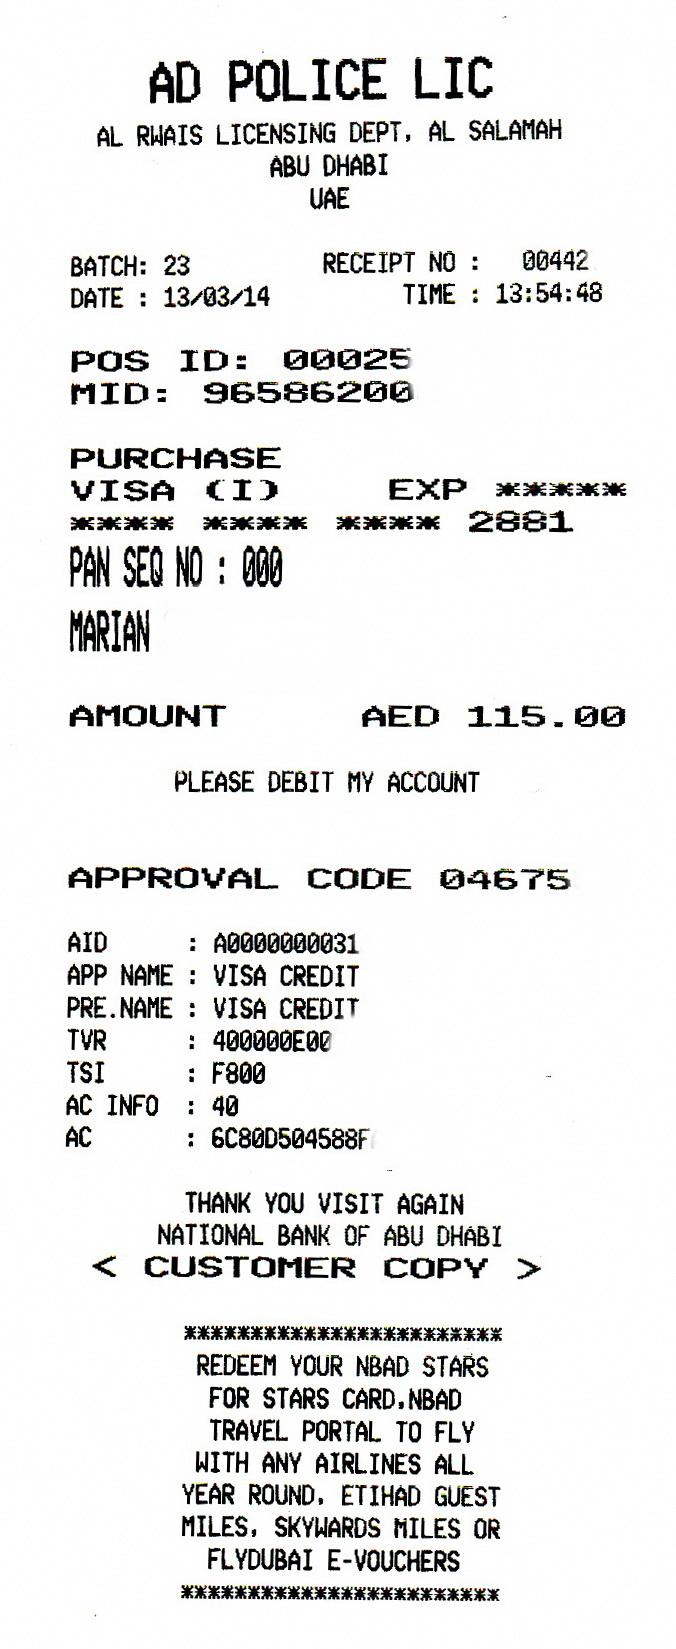 Capital One Mastercard Car Rental Insurance Coverage